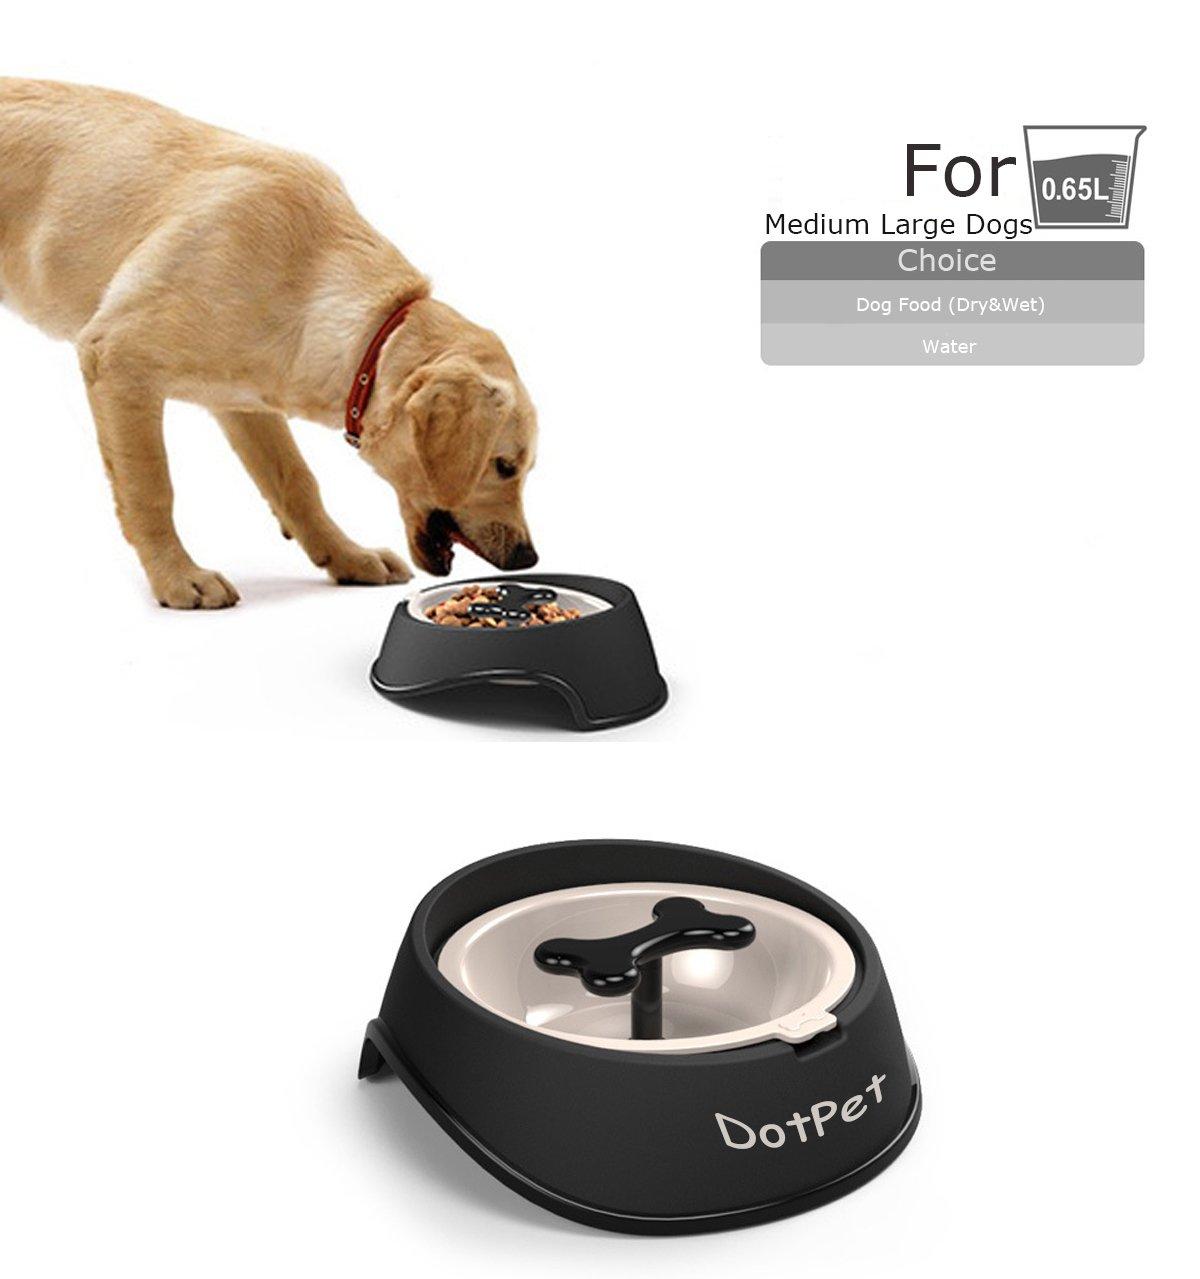 Cheap Dog Slow Feeder, find Dog Slow Feeder deals on line at